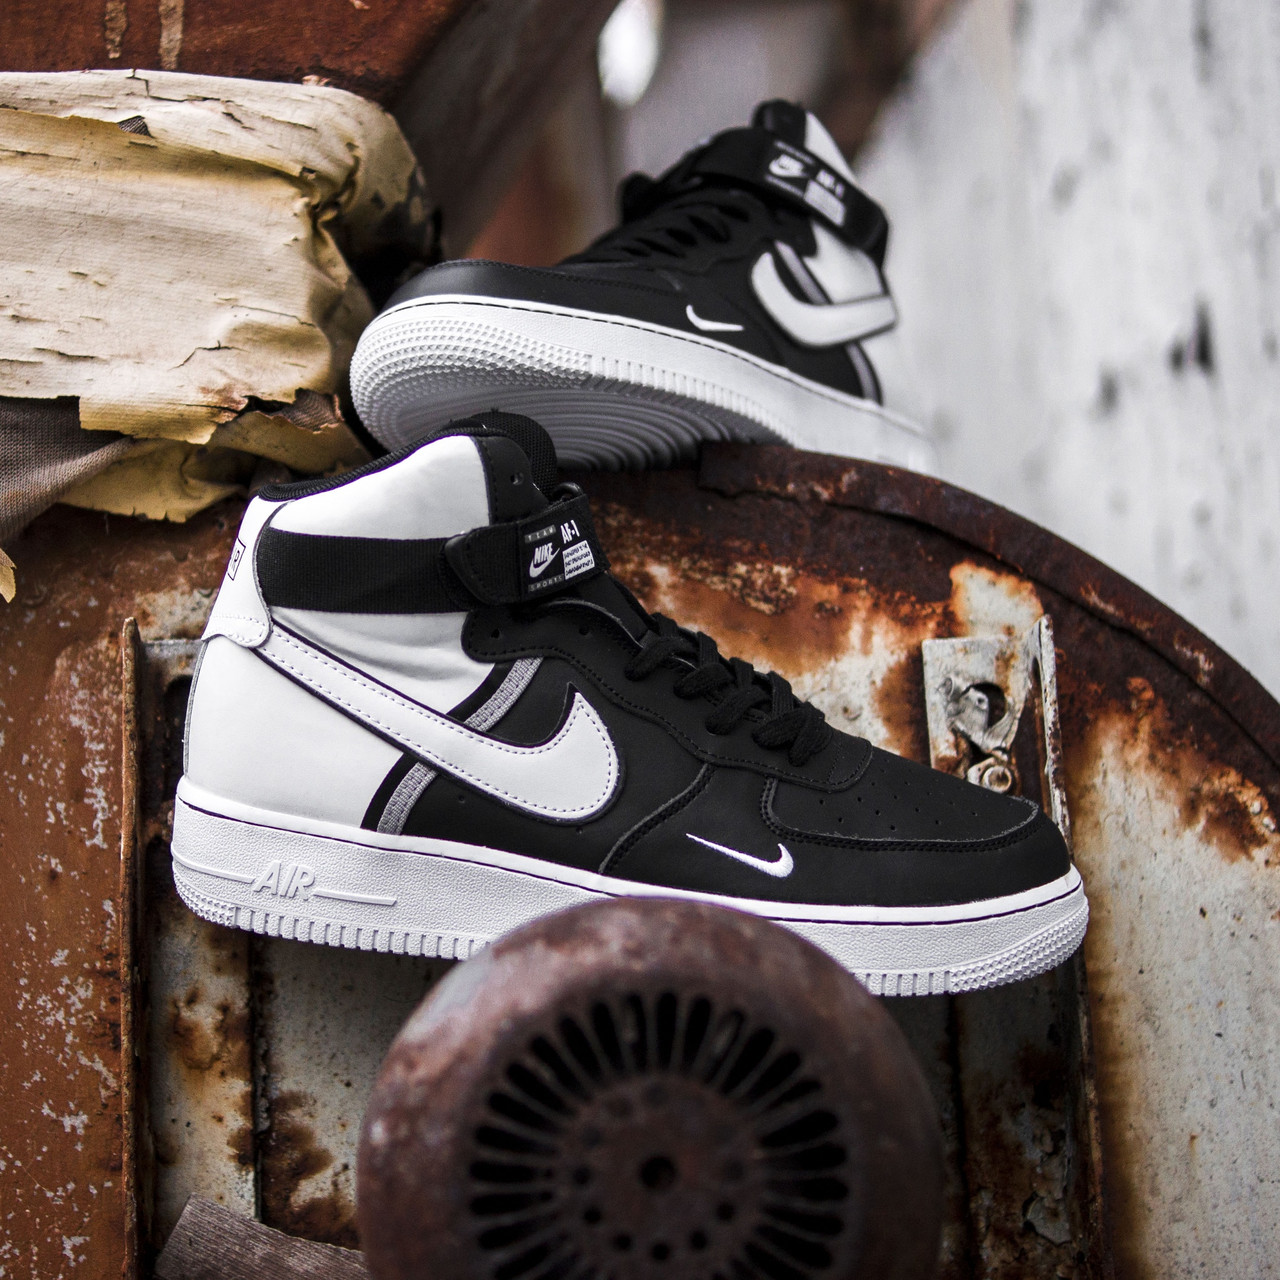 Мужские кроссовки Nike Air Force High LV8 Black/White, Реплика